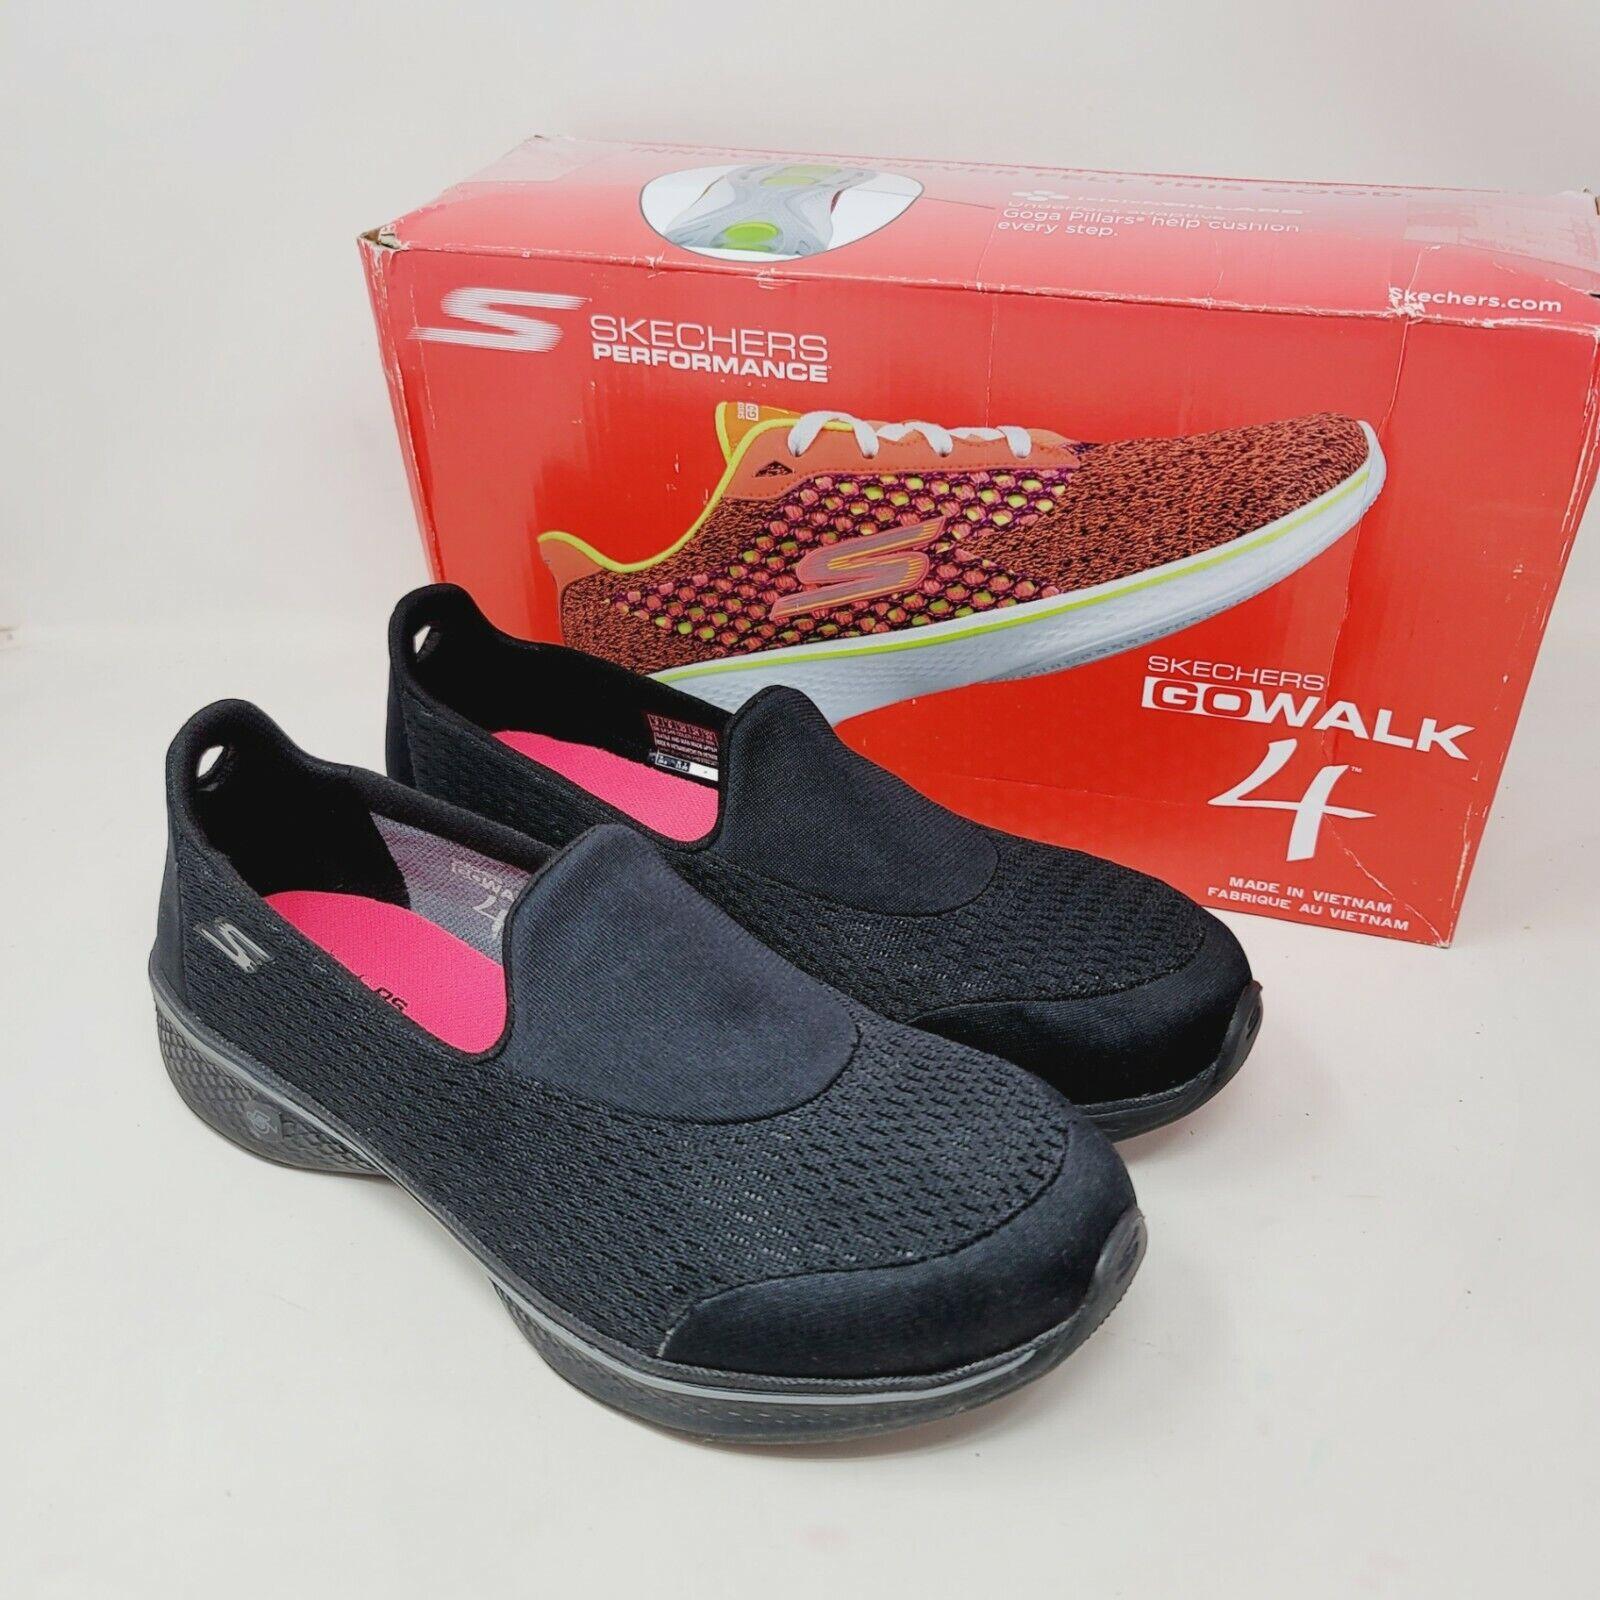 Skechers Go Walk 4 Performance Womens Shoes Gray Goga Max Slip On Comfort Size 9